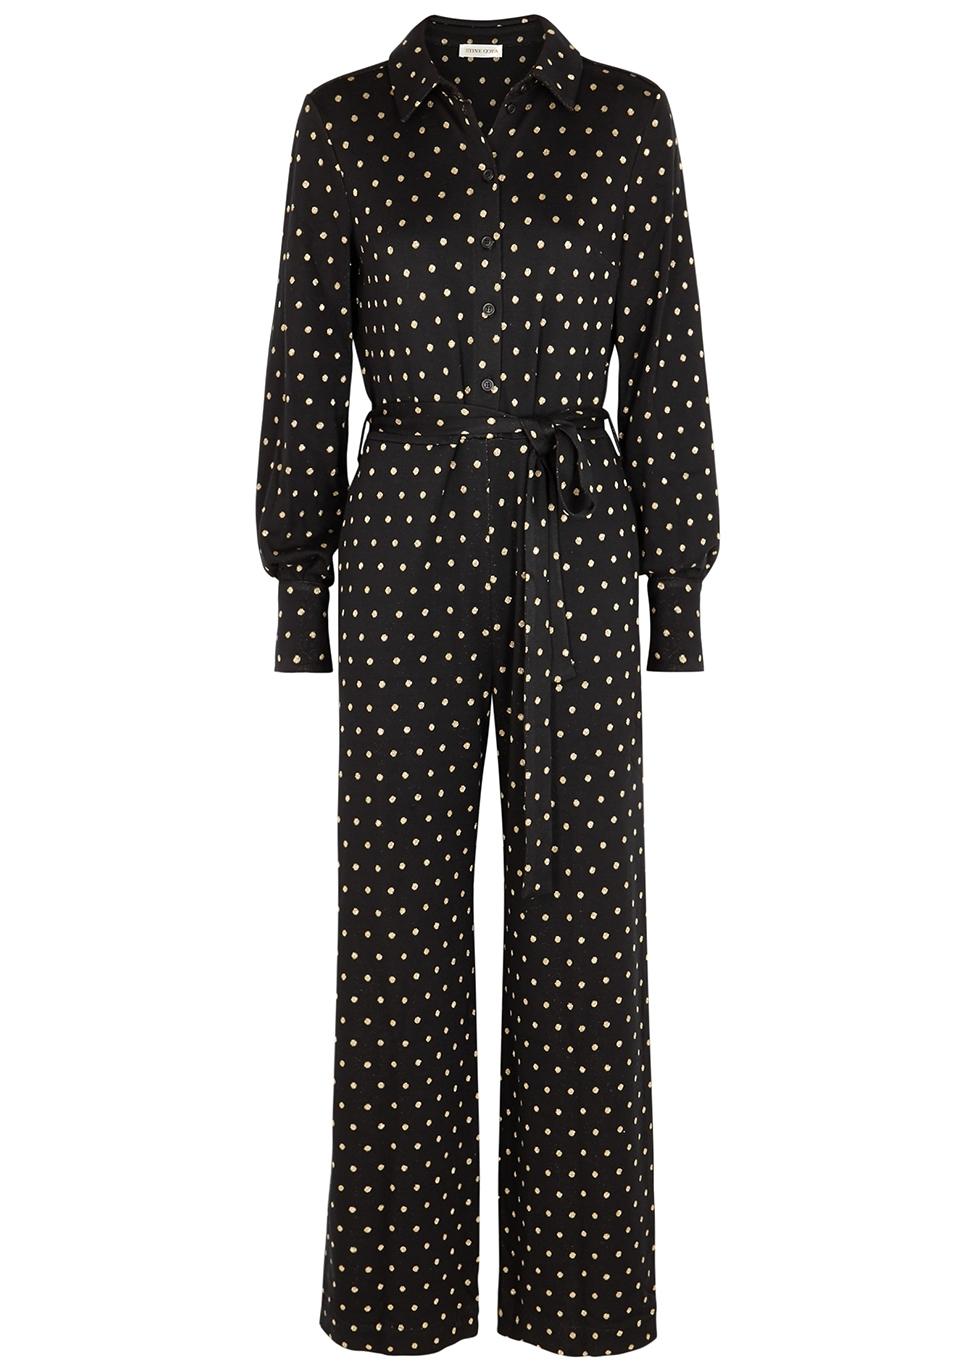 3b6a503d6f Designer Jumpsuits and Luxury Playsuits - Harvey Nichols